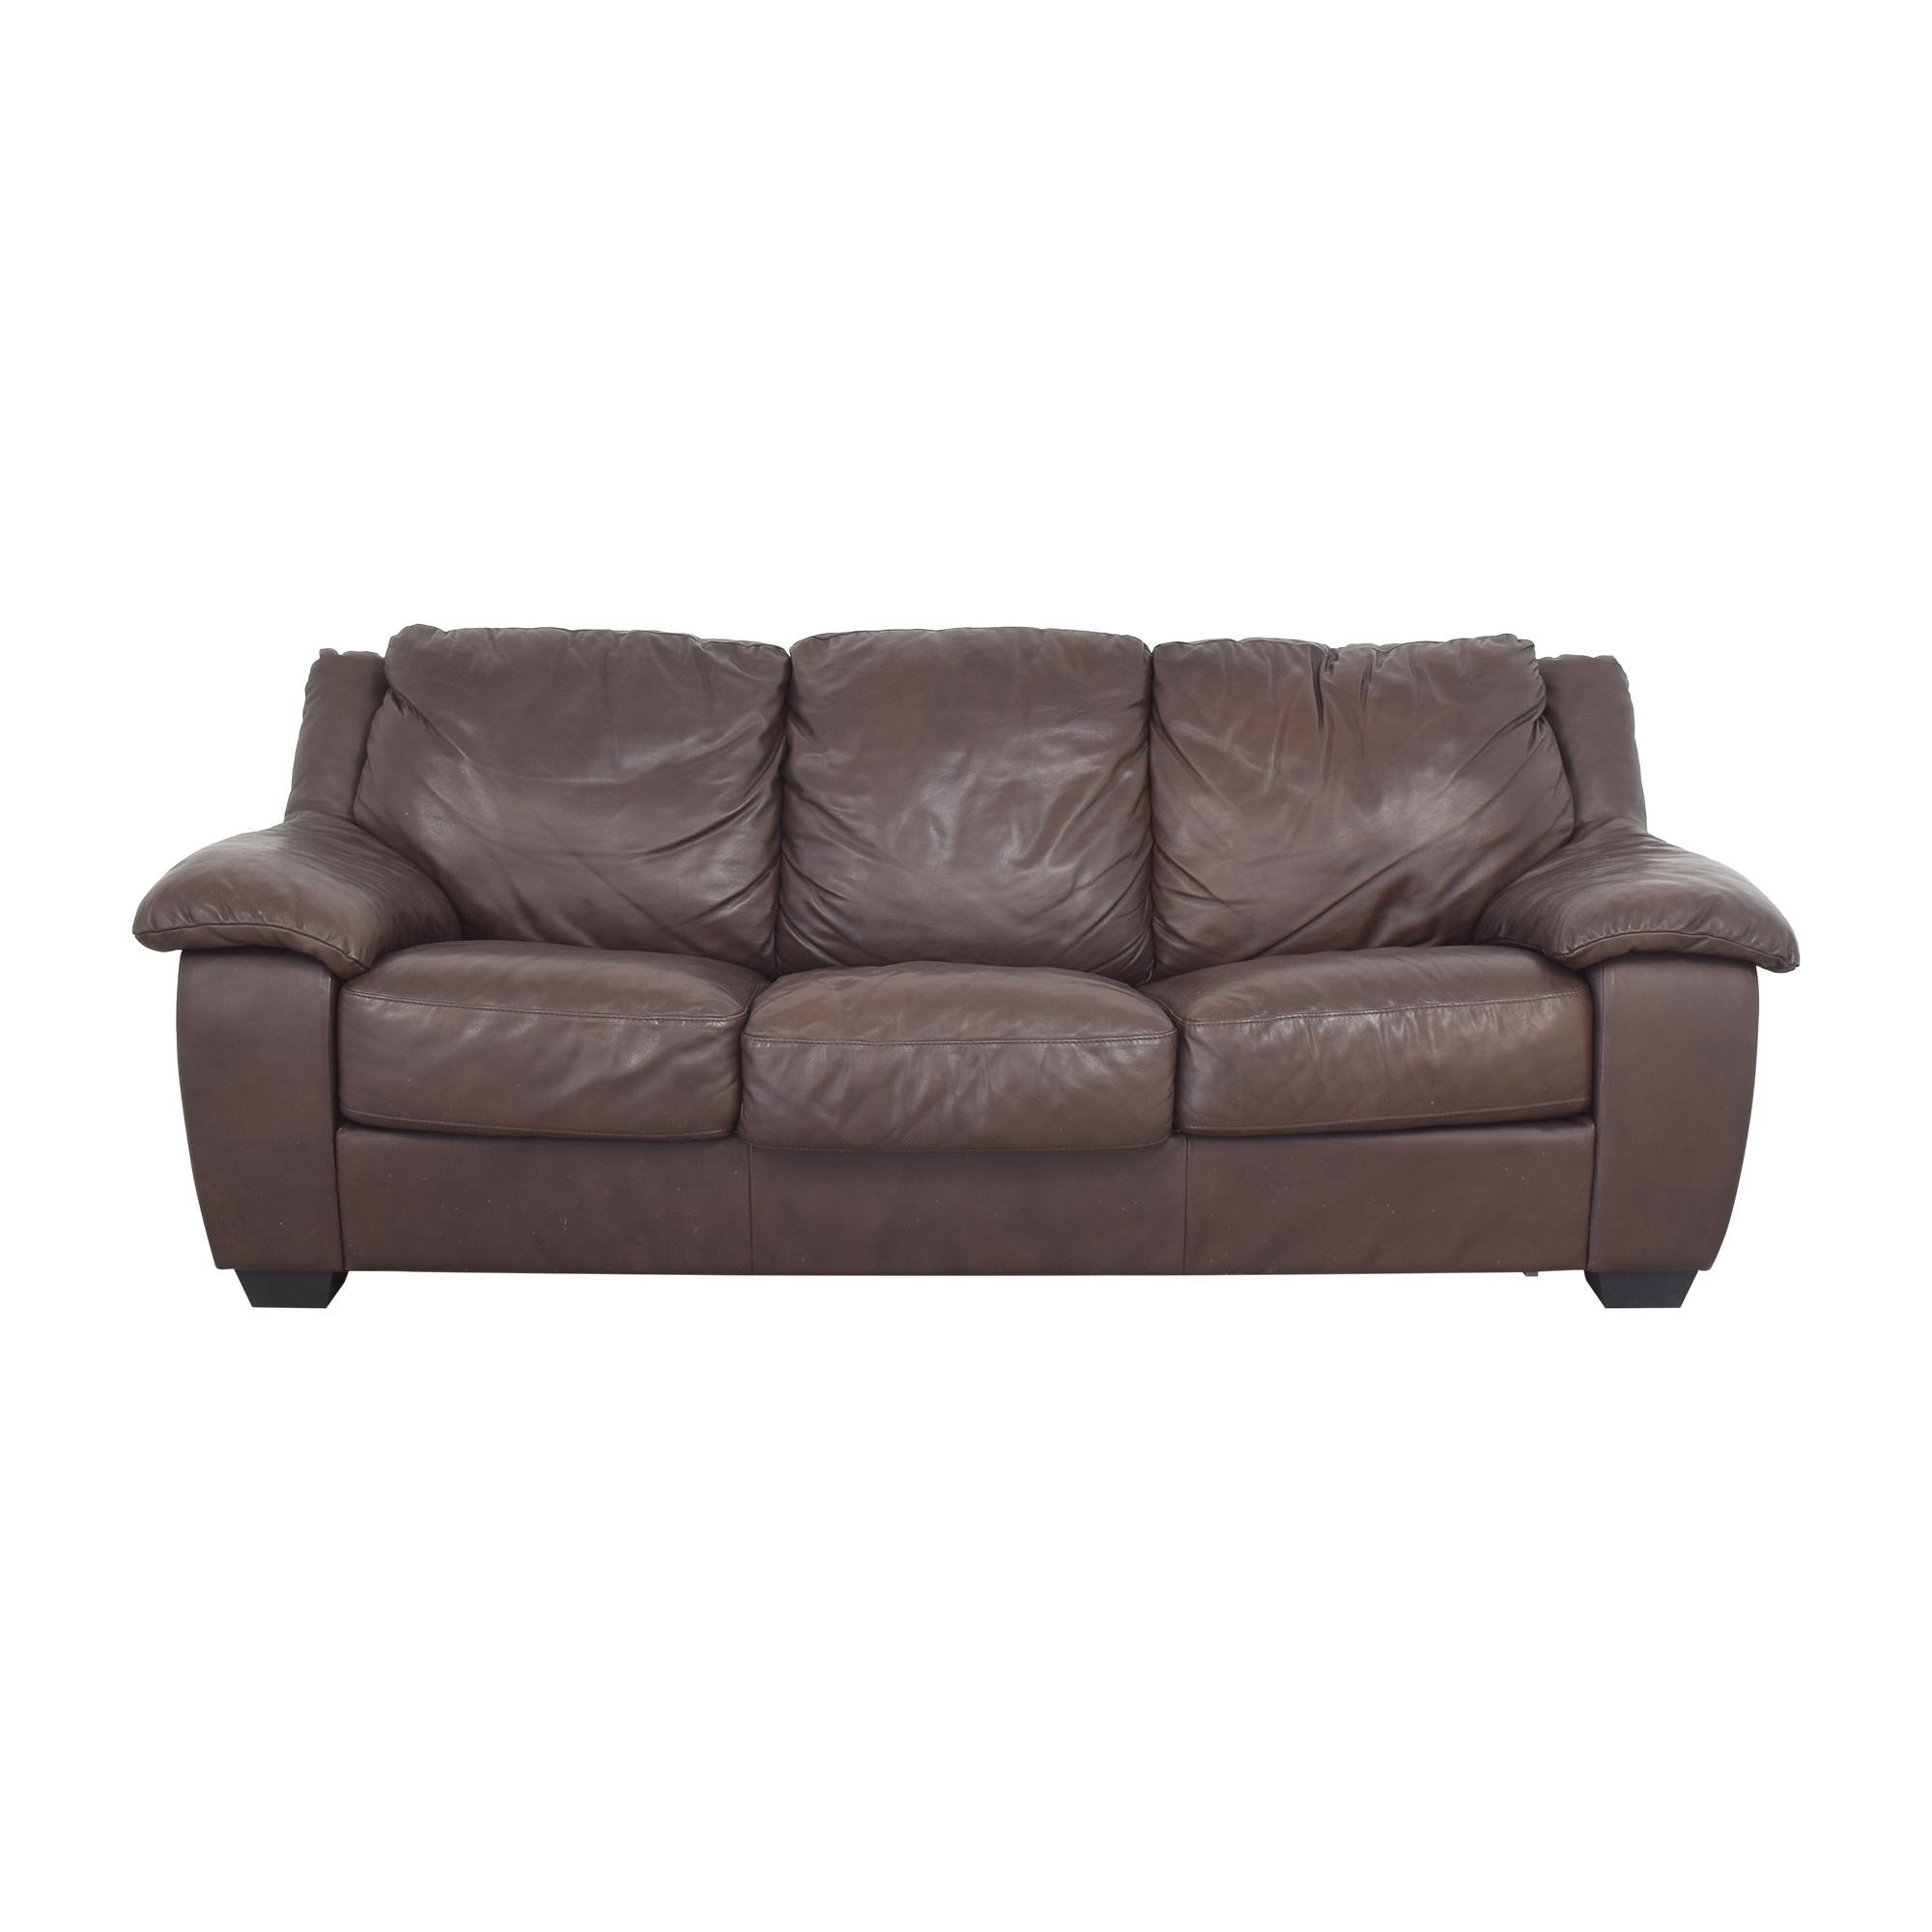 Macy's Macy's Lothan Queen Sleeper Sofa used